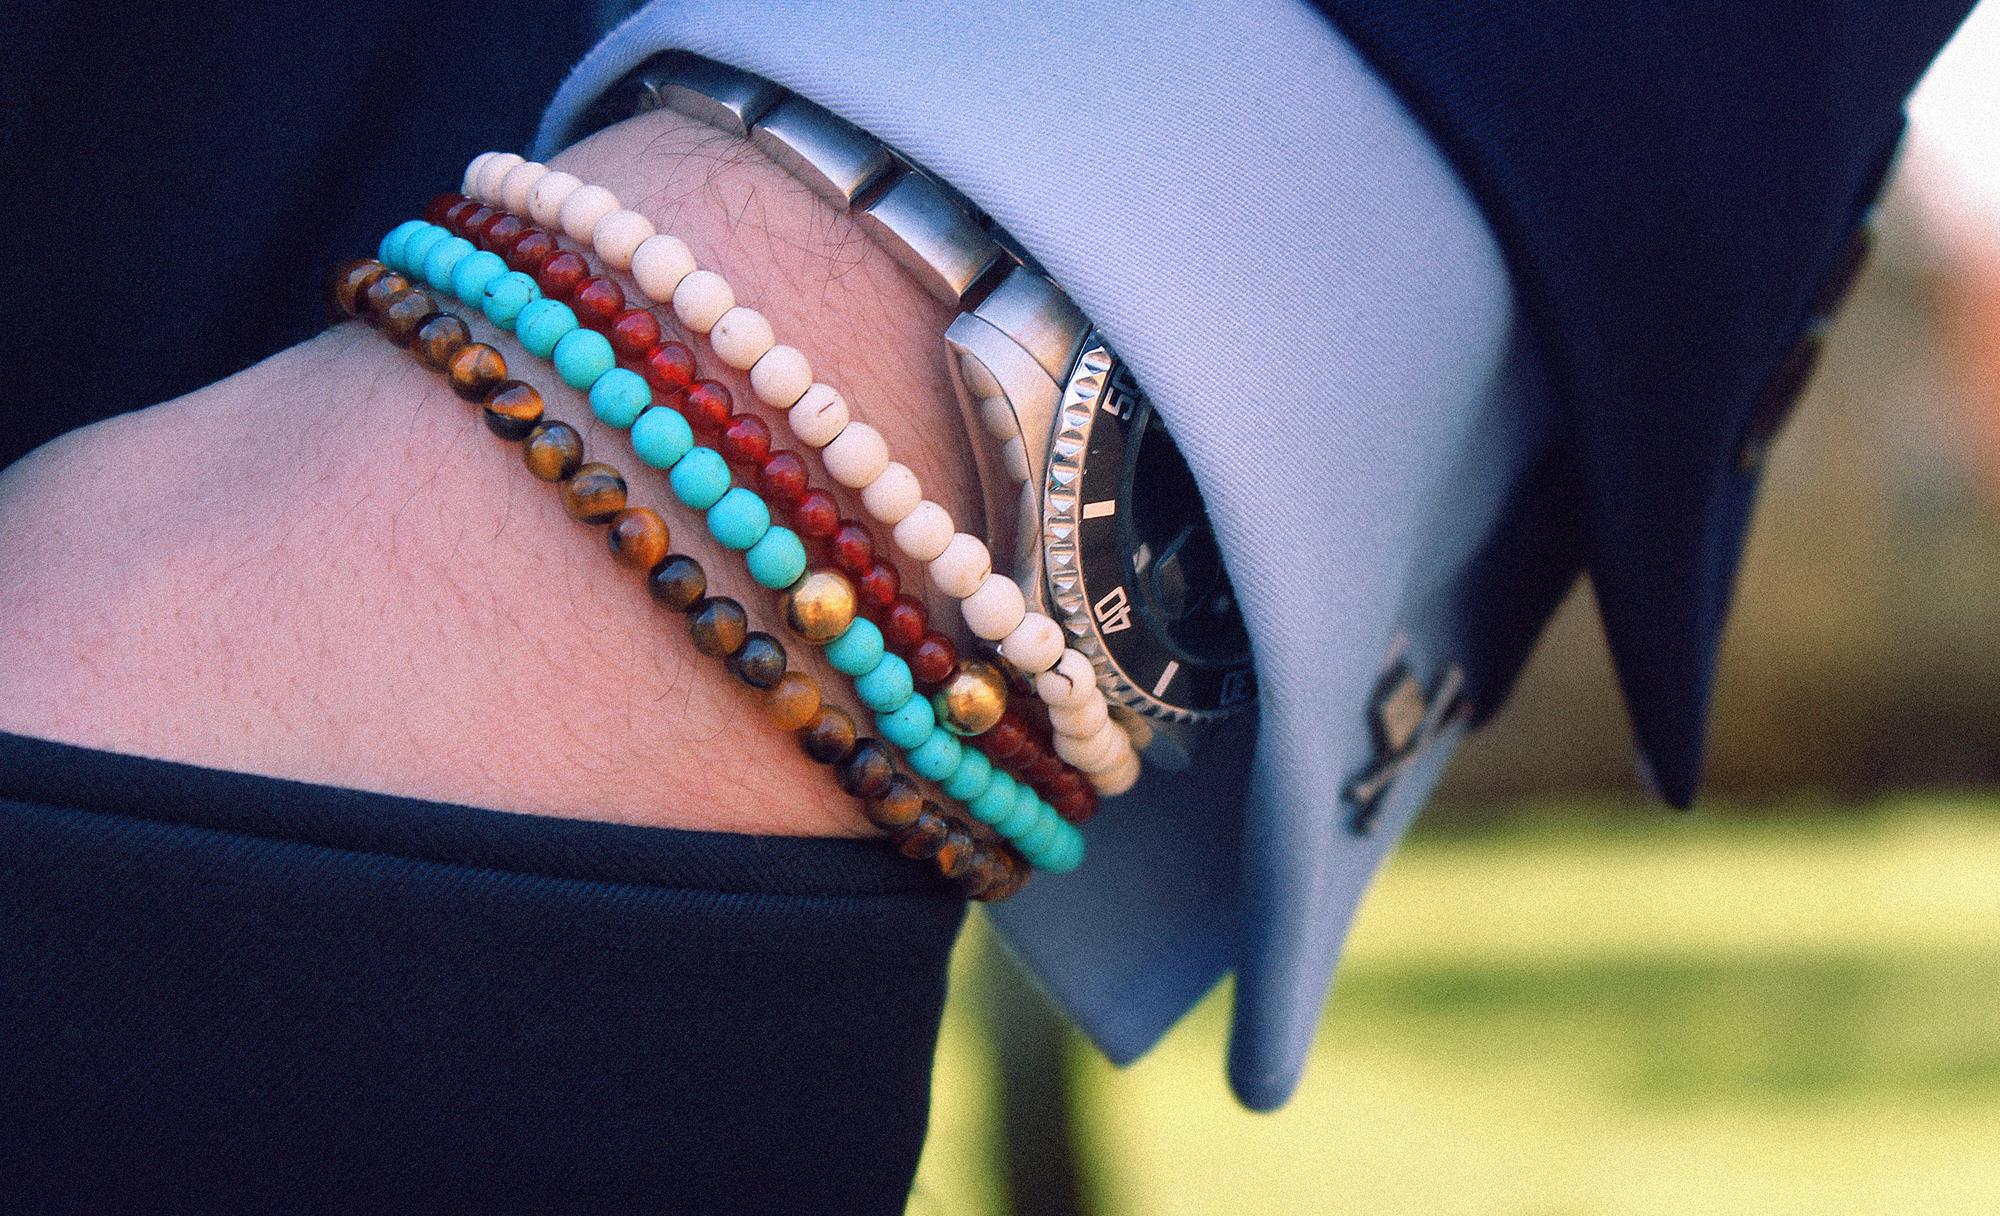 Men beaded bracelets and watch